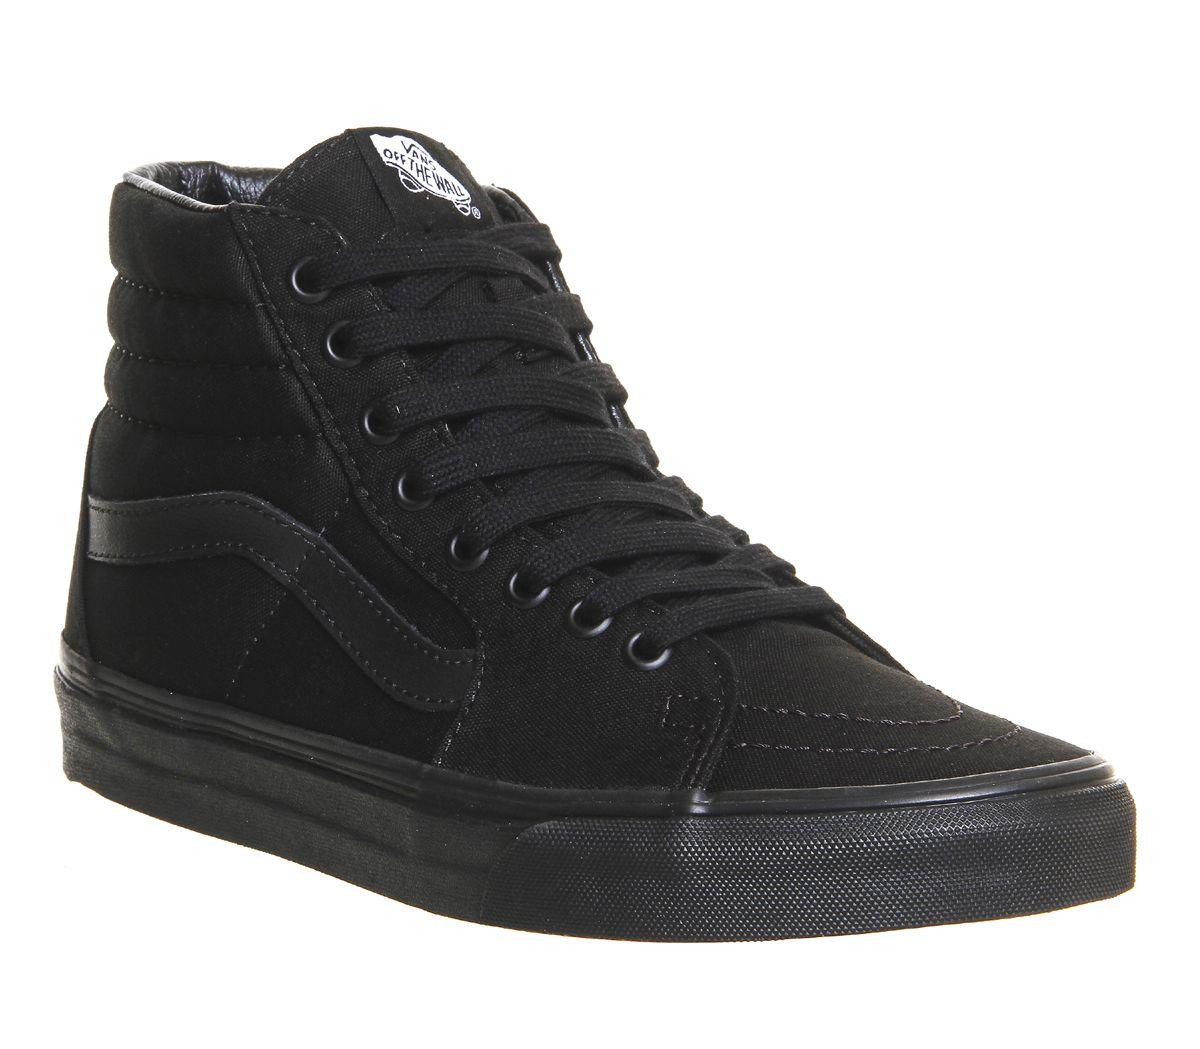 3586b30f2e Vans Sk8 Hi Black Mono - Hers trainers